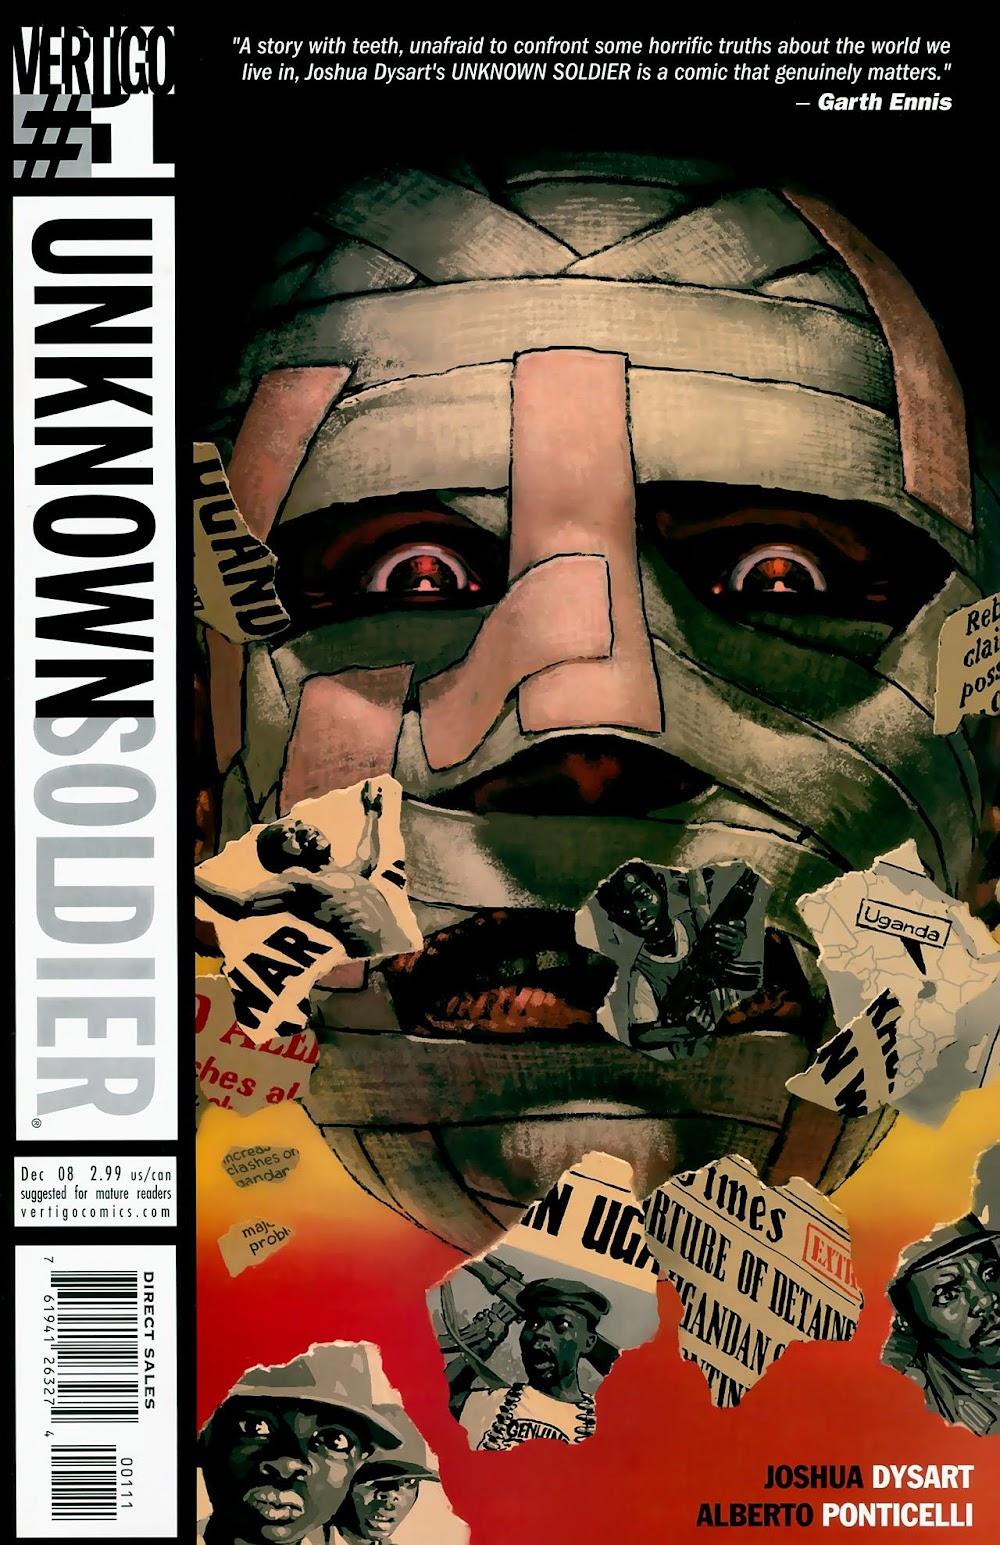 Unknown Soldier (2008) - complete